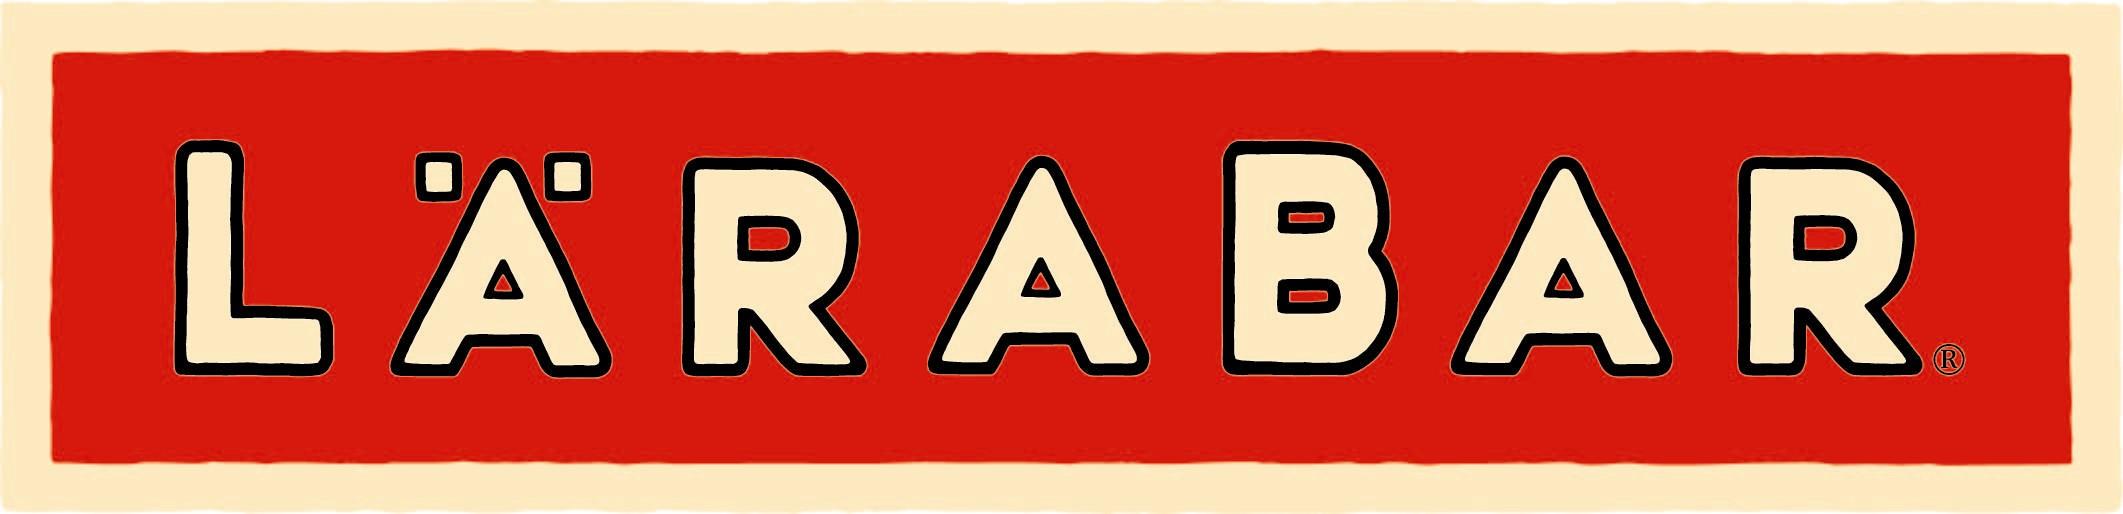 Image result for lara bars